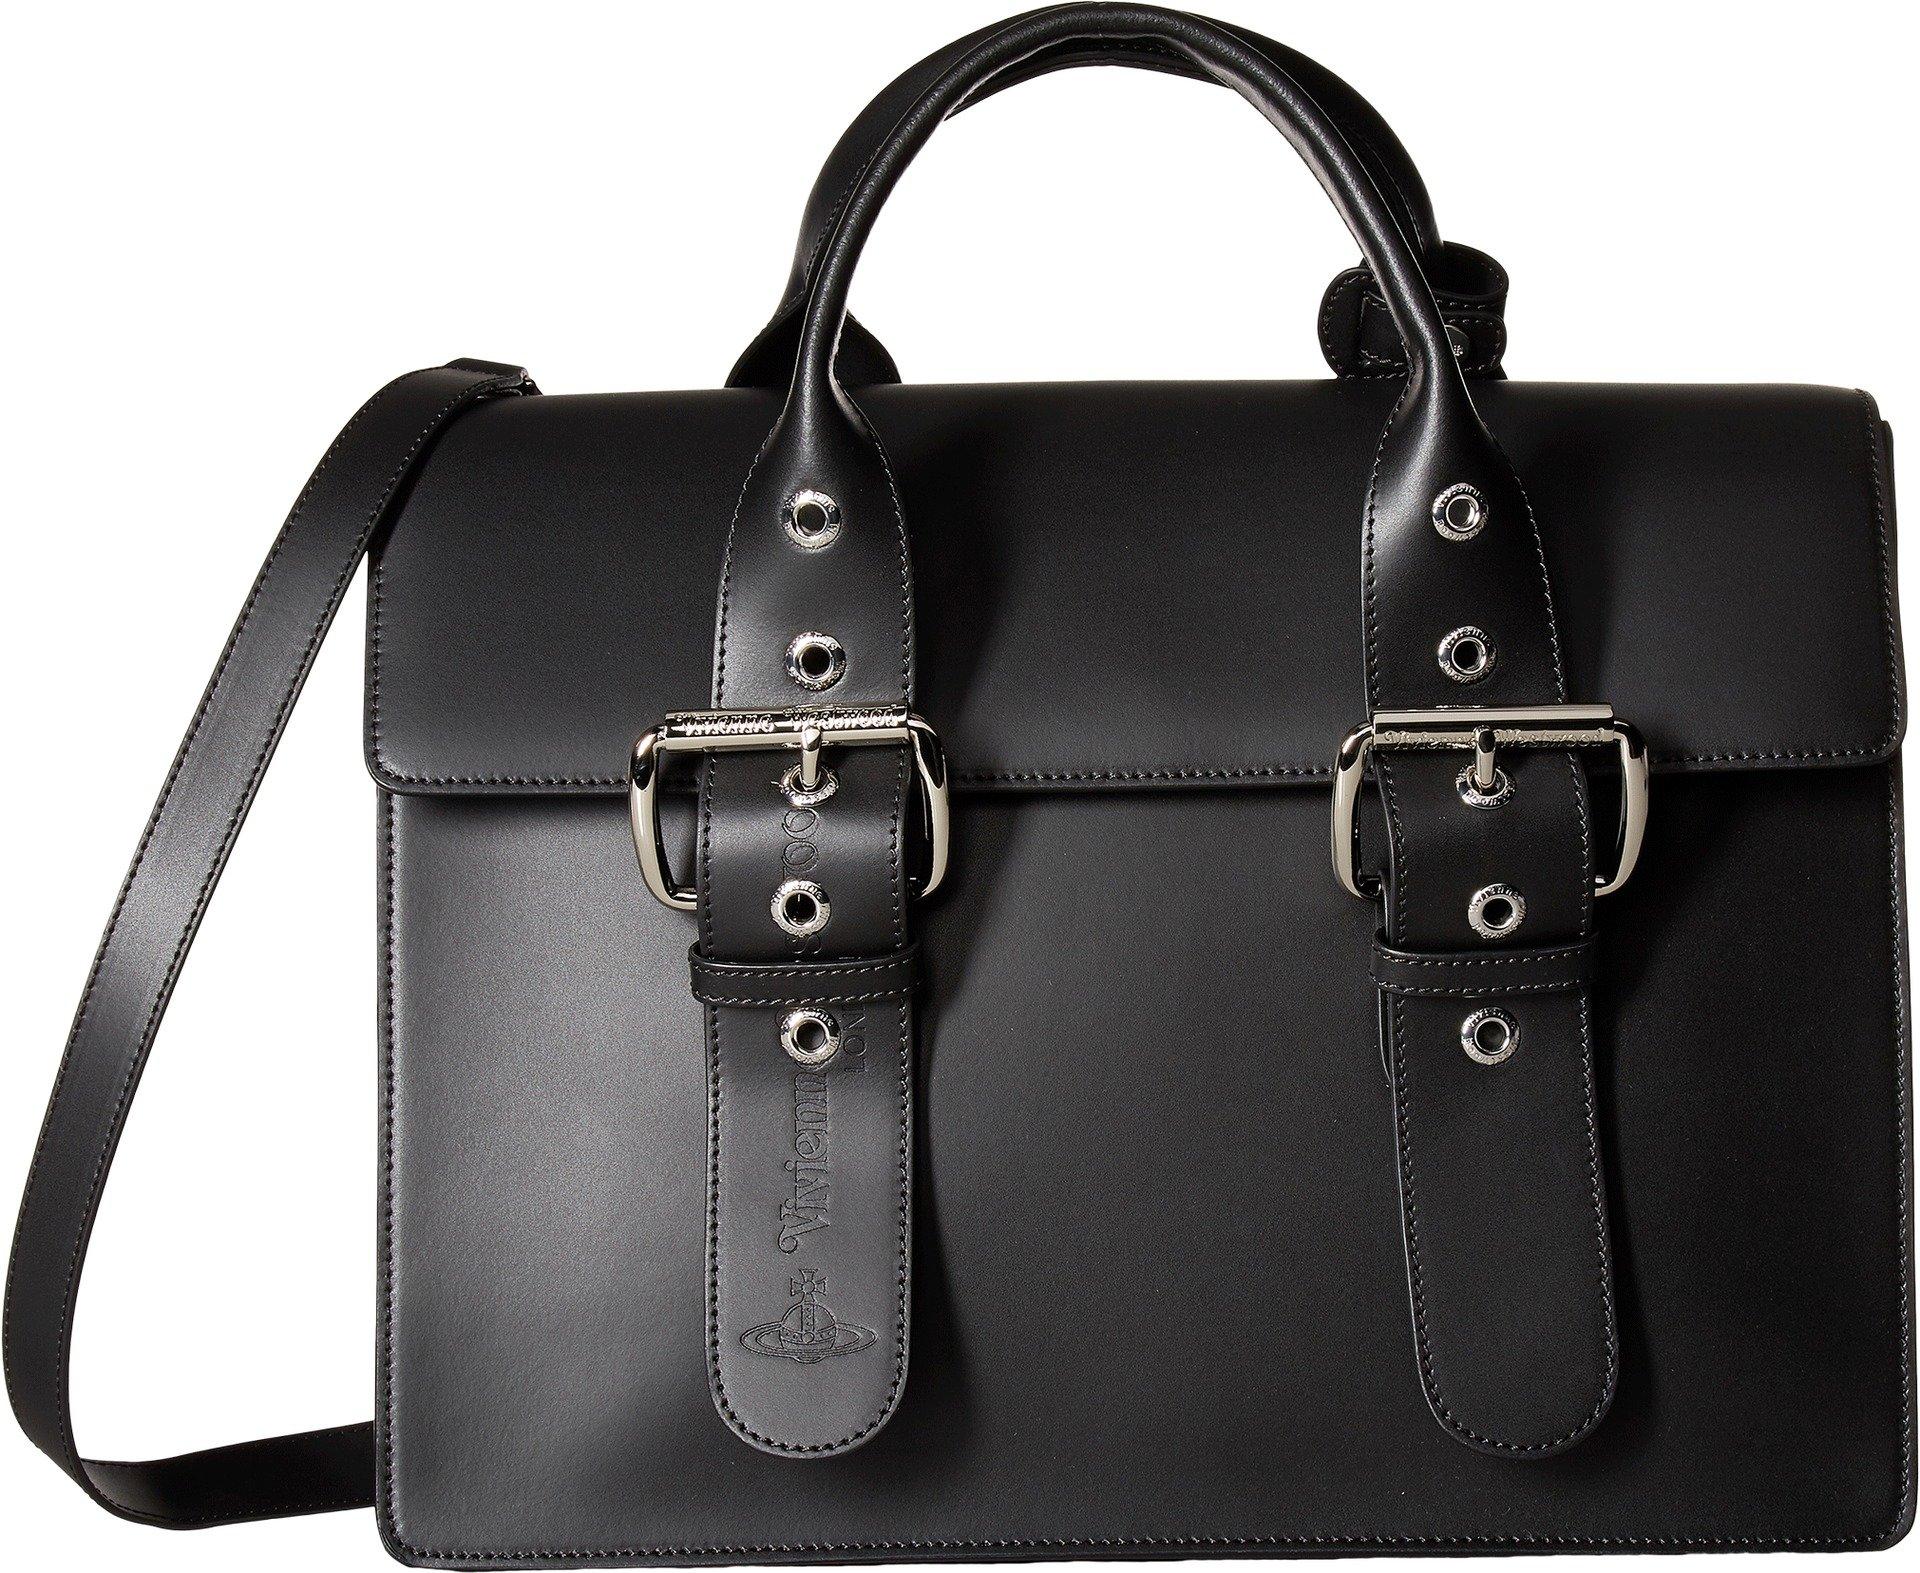 Vivienne Westwood Women's Alex Business Bag Black One Size by Vivienne Westwood